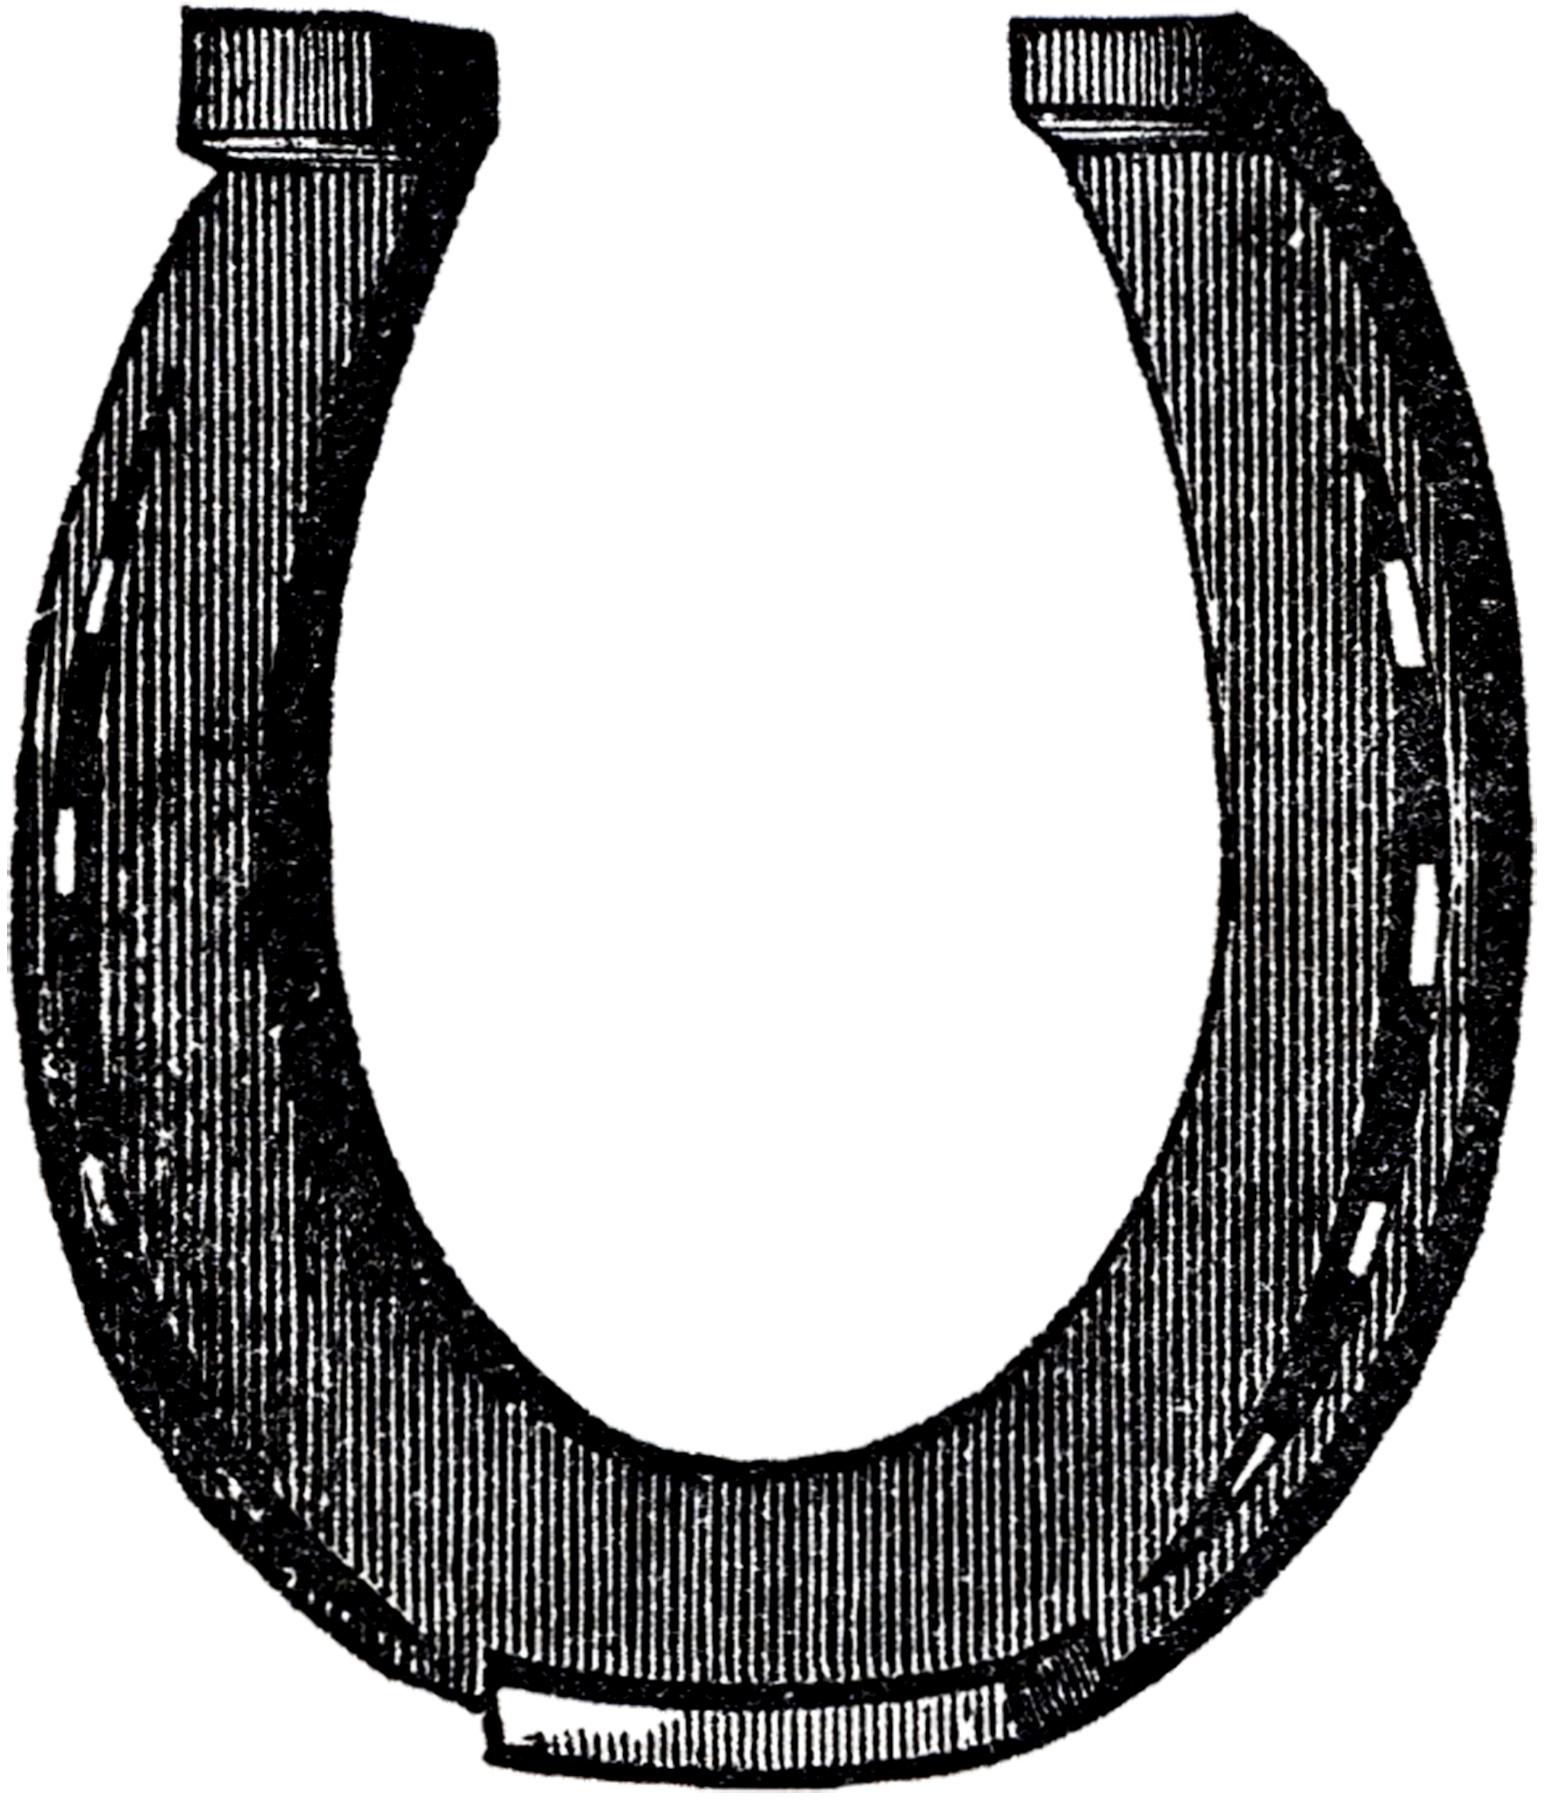 1544x1800 Free Horse Shoe Clip Art!